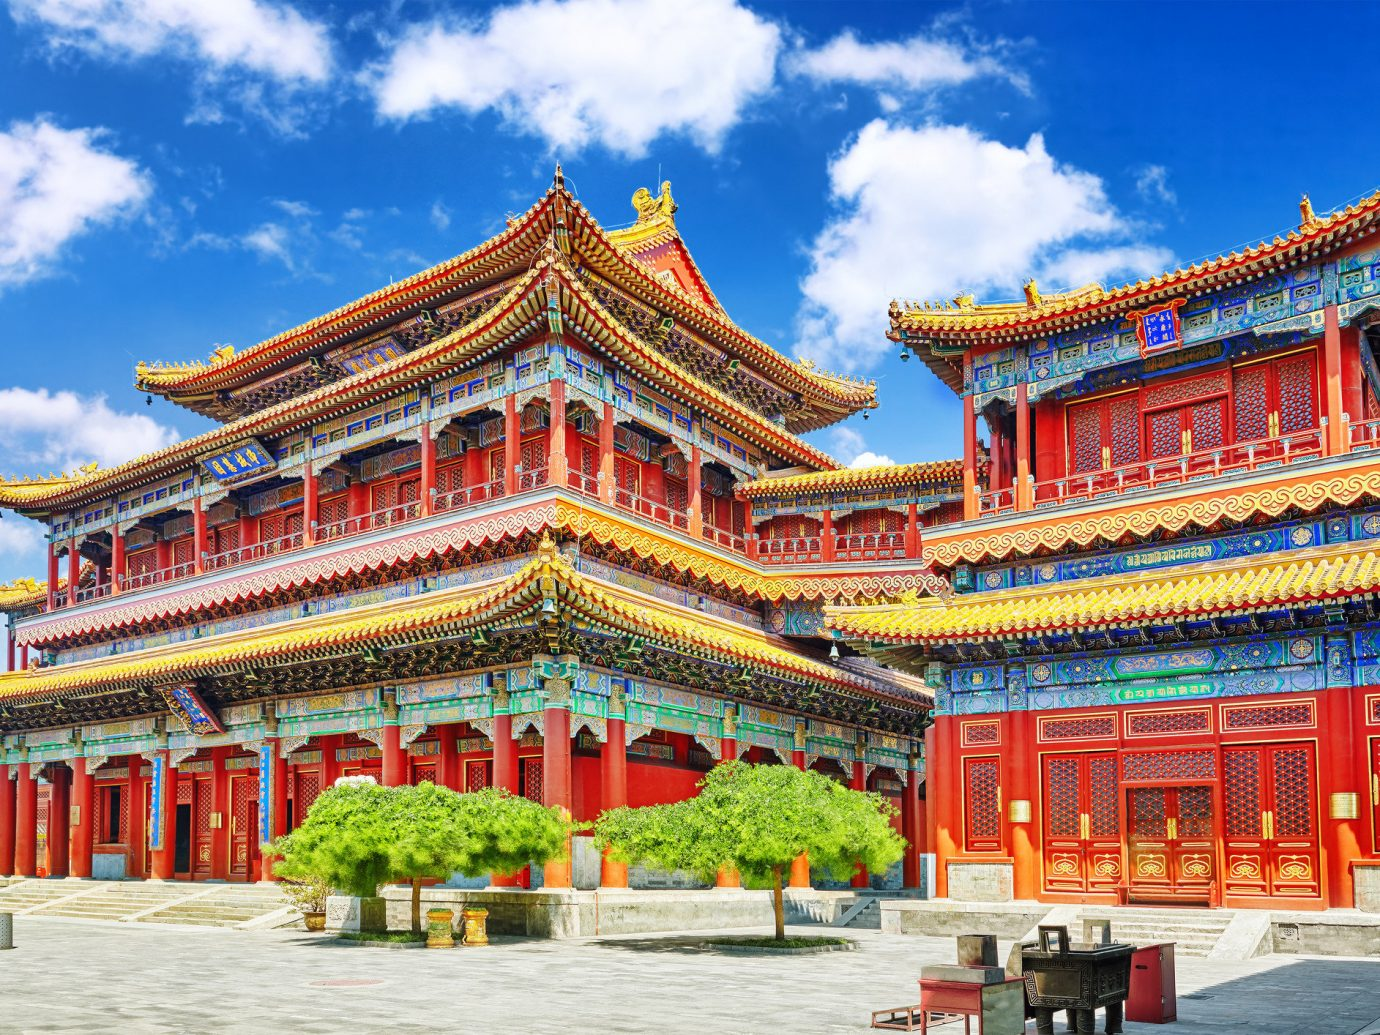 Trip Ideas sky place of worship chinese architecture lamasery temple building historic site landmark hindu temple palace pagoda tower shrine shinto shrine orange colorful